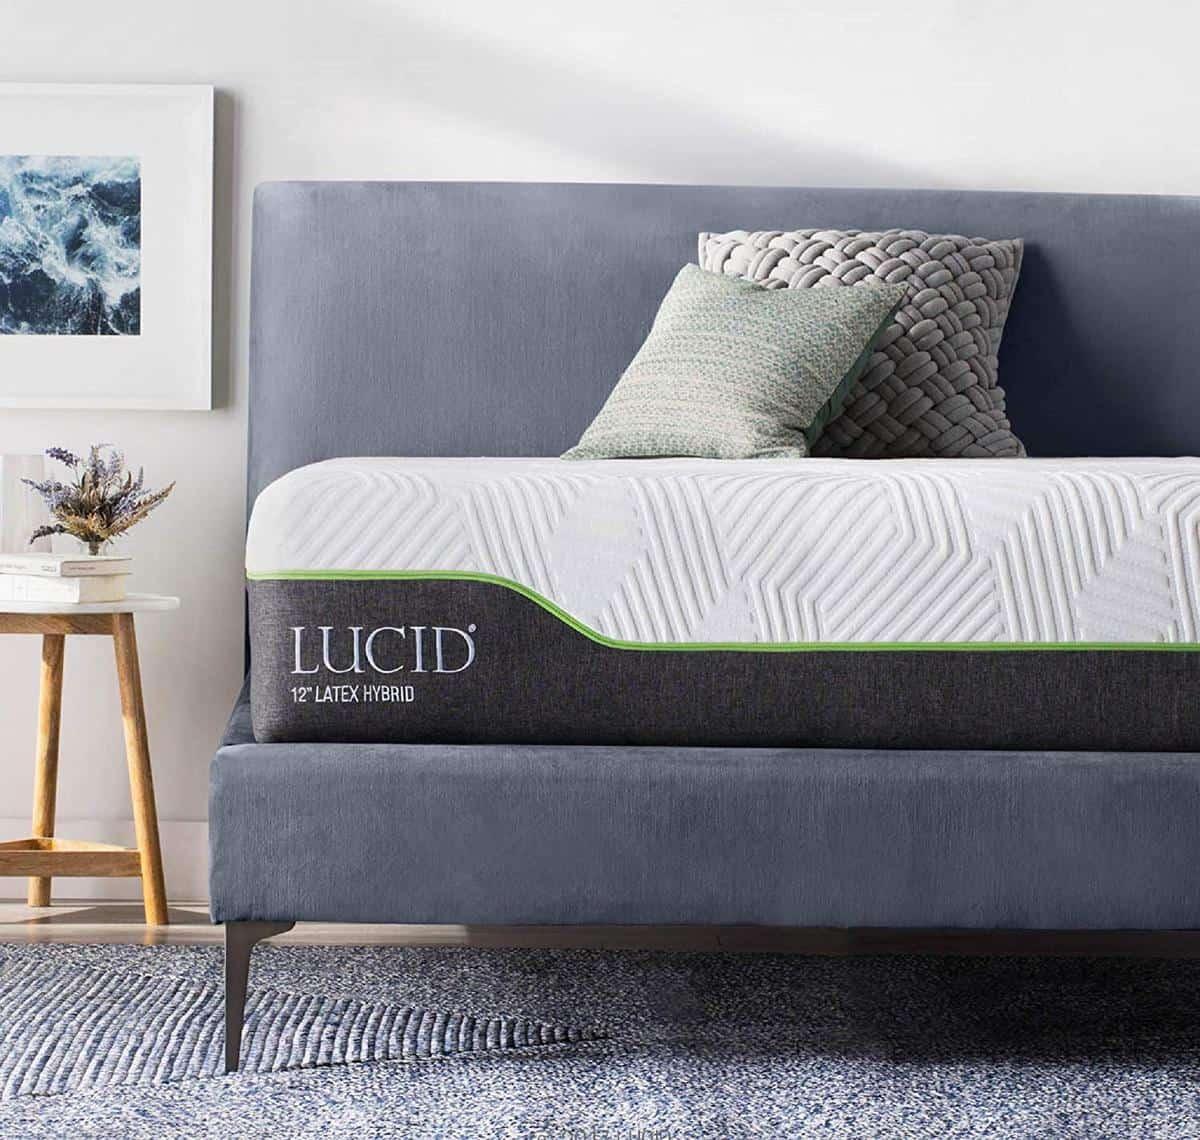 Lucid Hybrid Latex Mattress